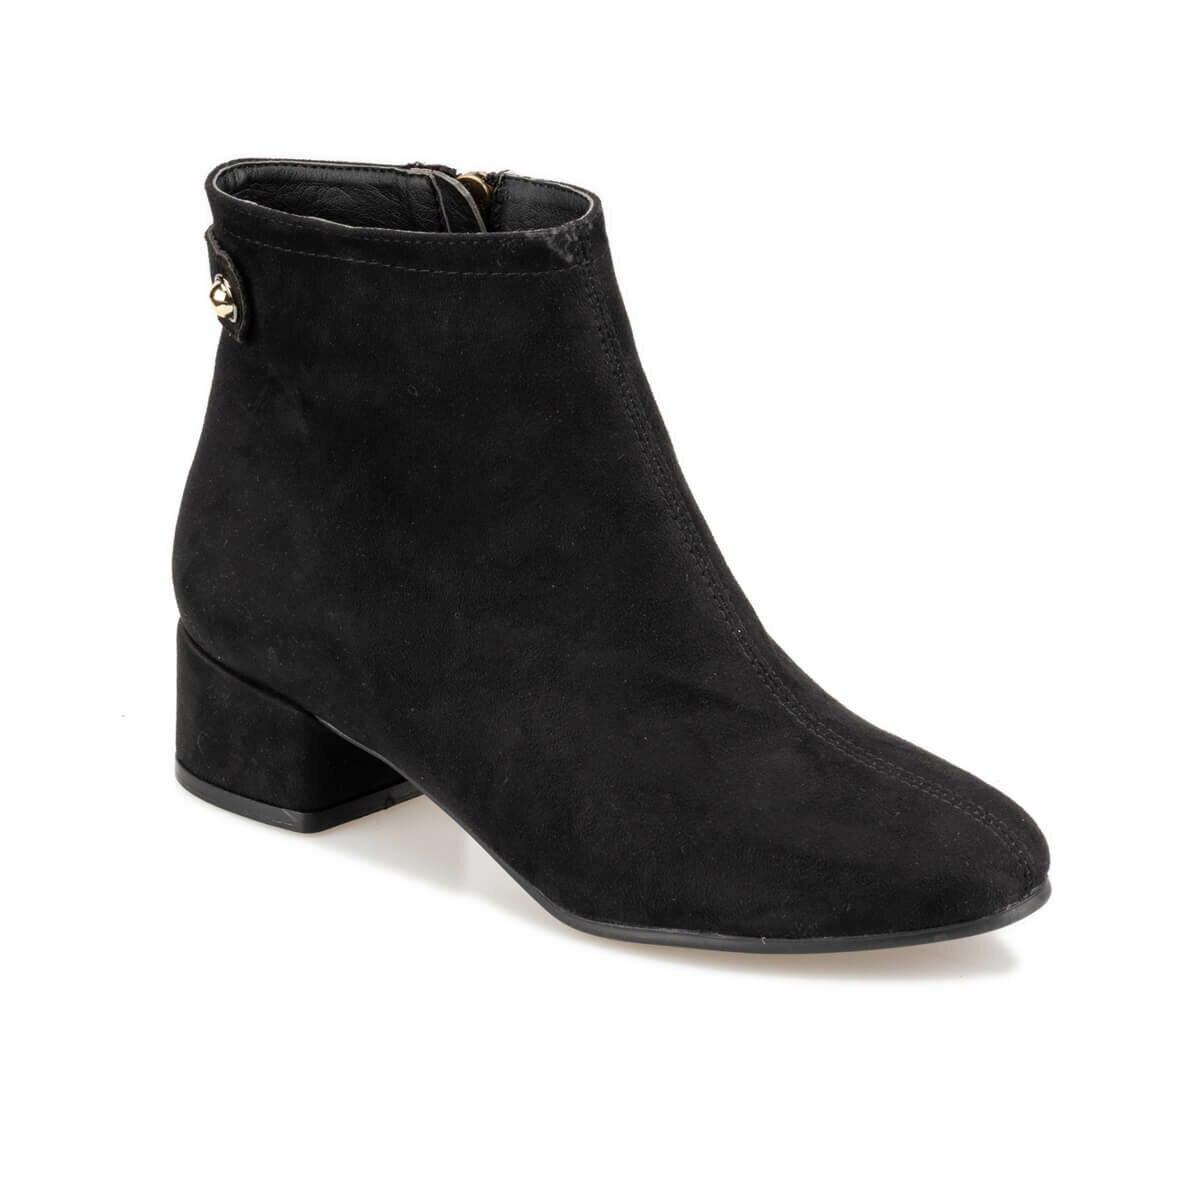 FLO 92.314347.Z أحذية نسائية سوداء بولاريس